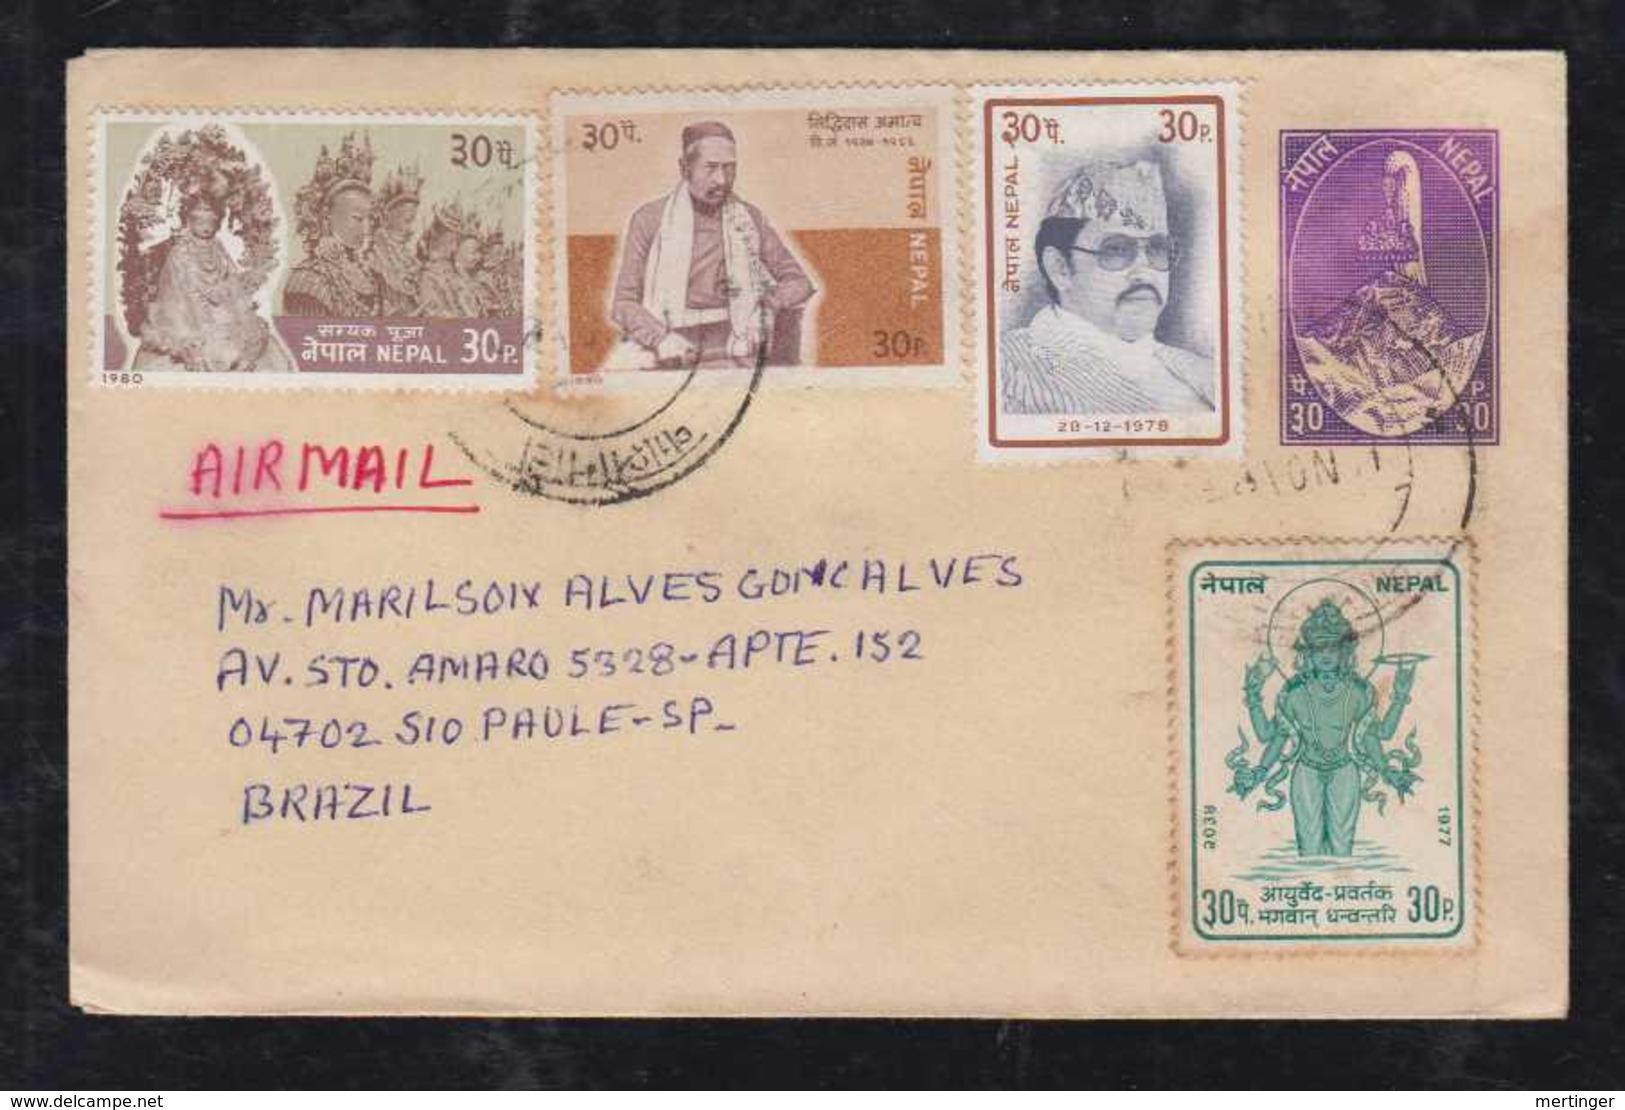 Nepal 1980 Airmail Cover Uprated Stationery To SAO PAULO Brazil - Nepal